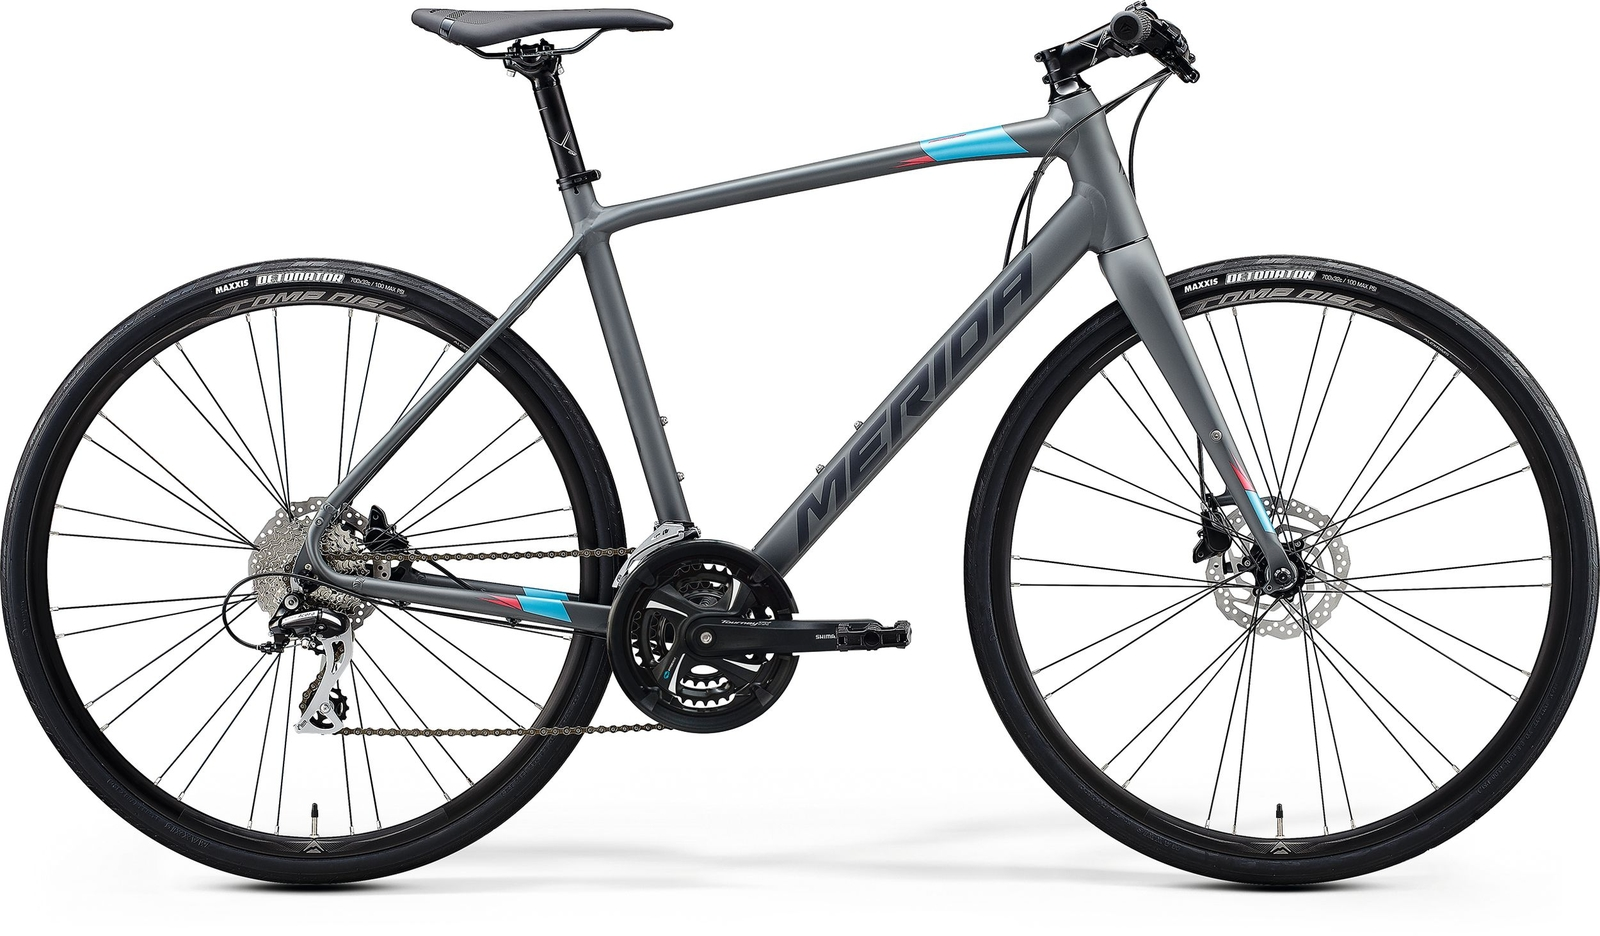 Bicicleta de sosea barbati Merida Speeder 100 Gri/Albastru 2020 imagine